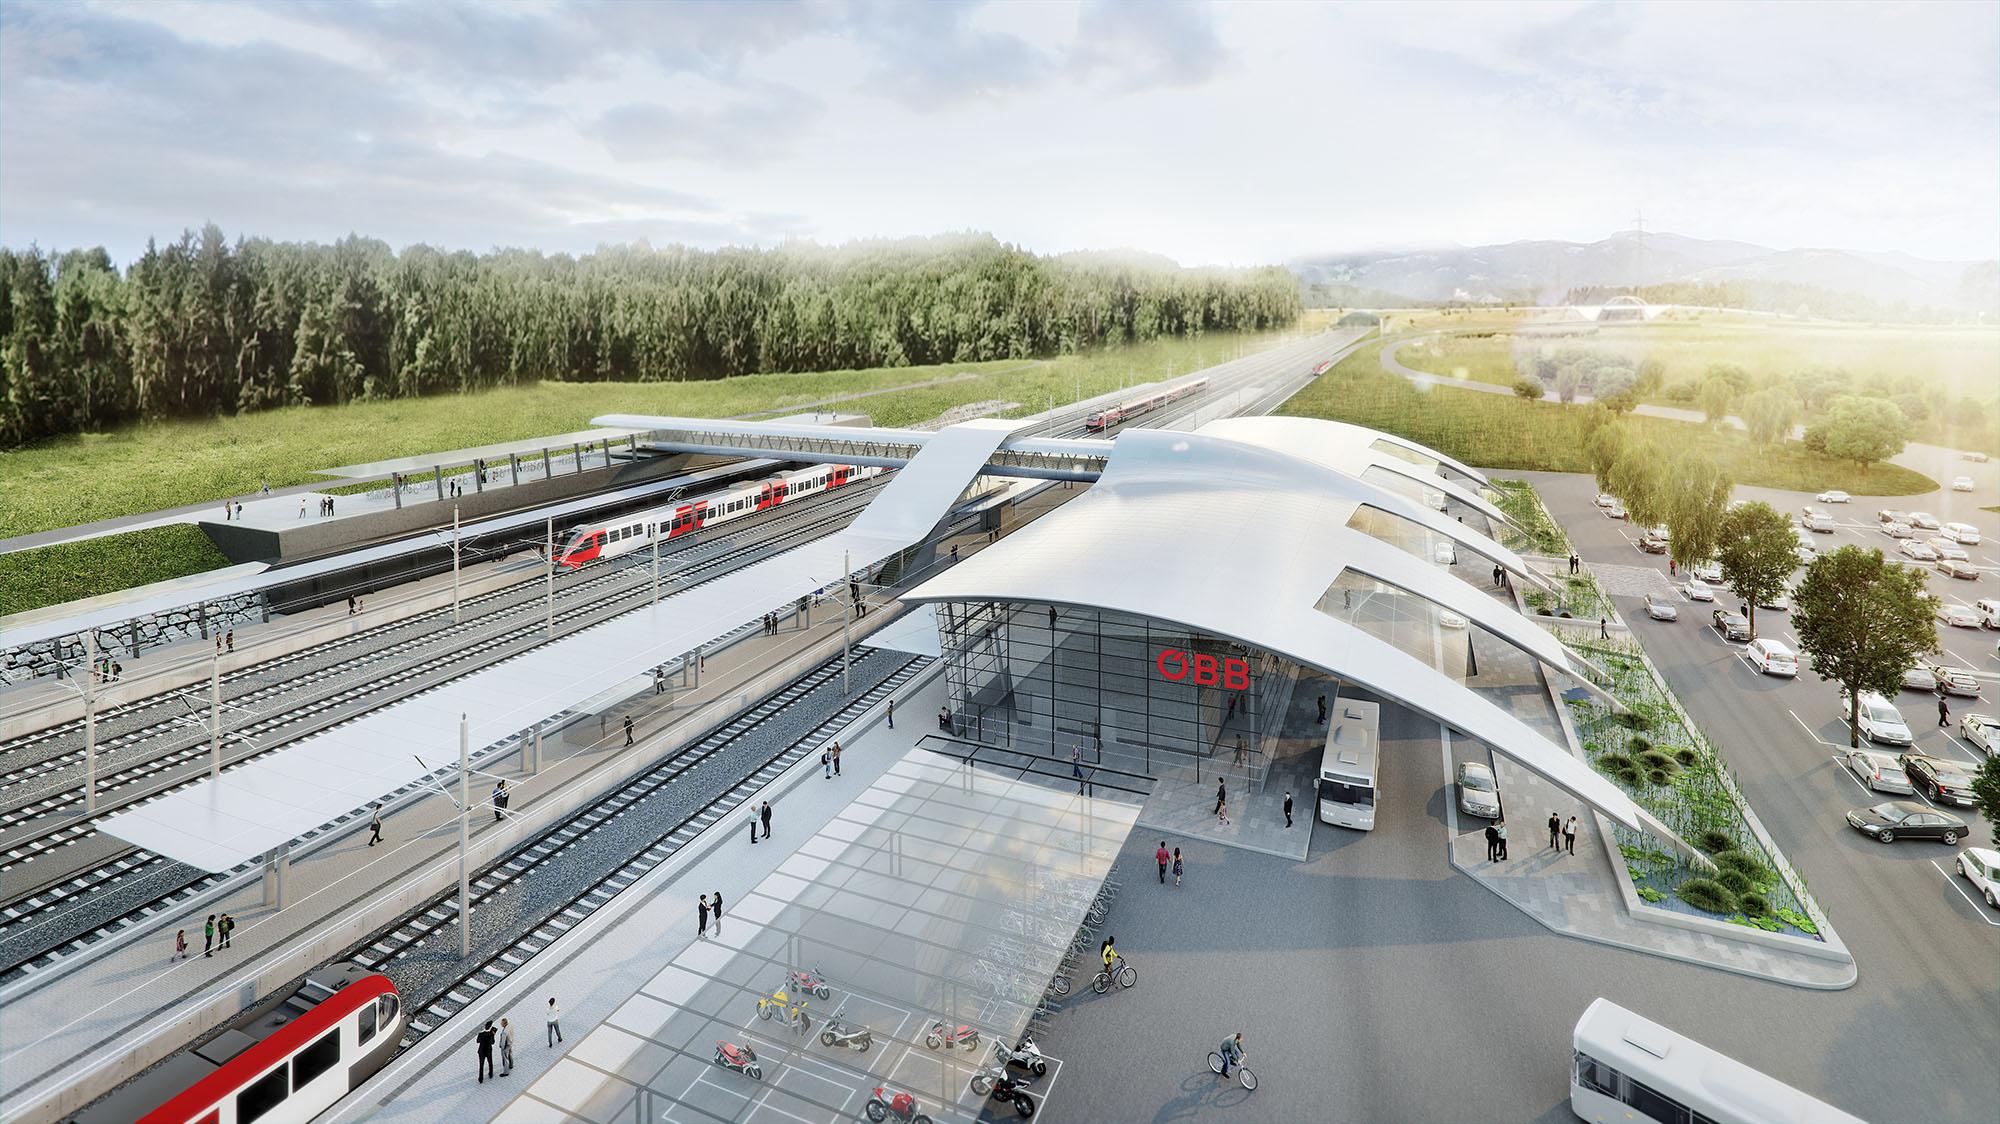 OEBB station in Styria